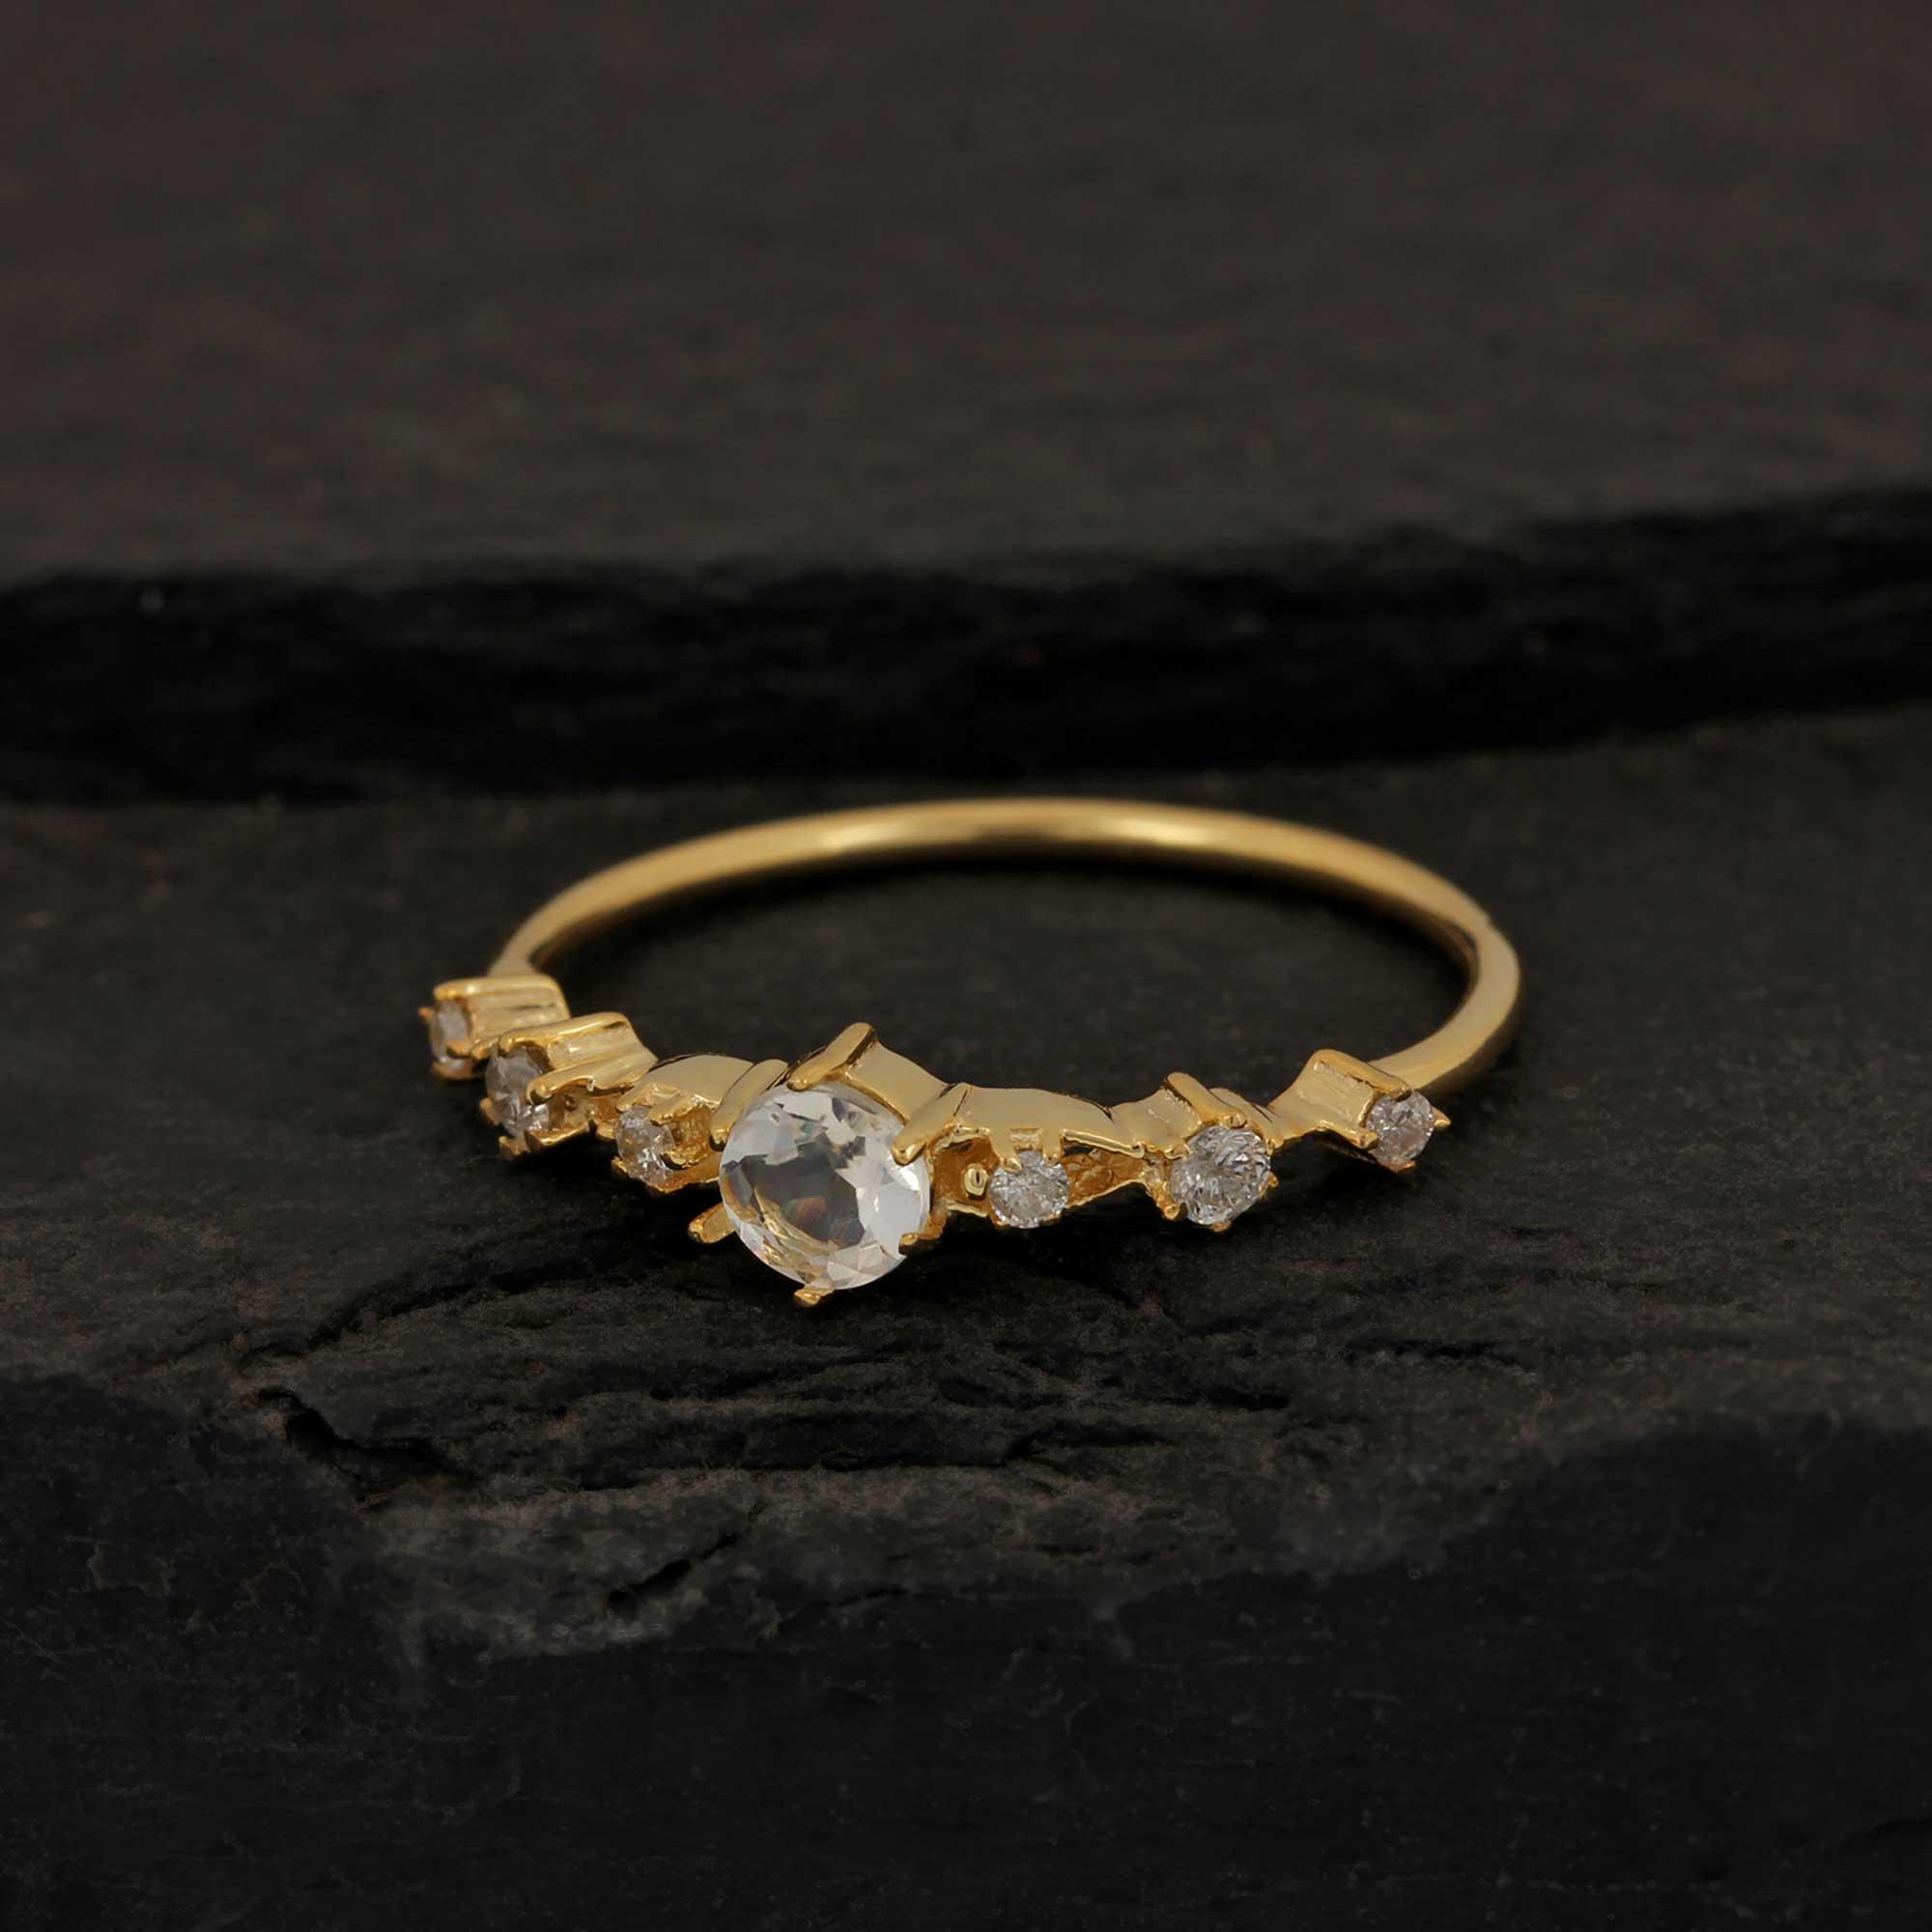 14k Solid Gold Diamond Moonstone Gemstone Ring